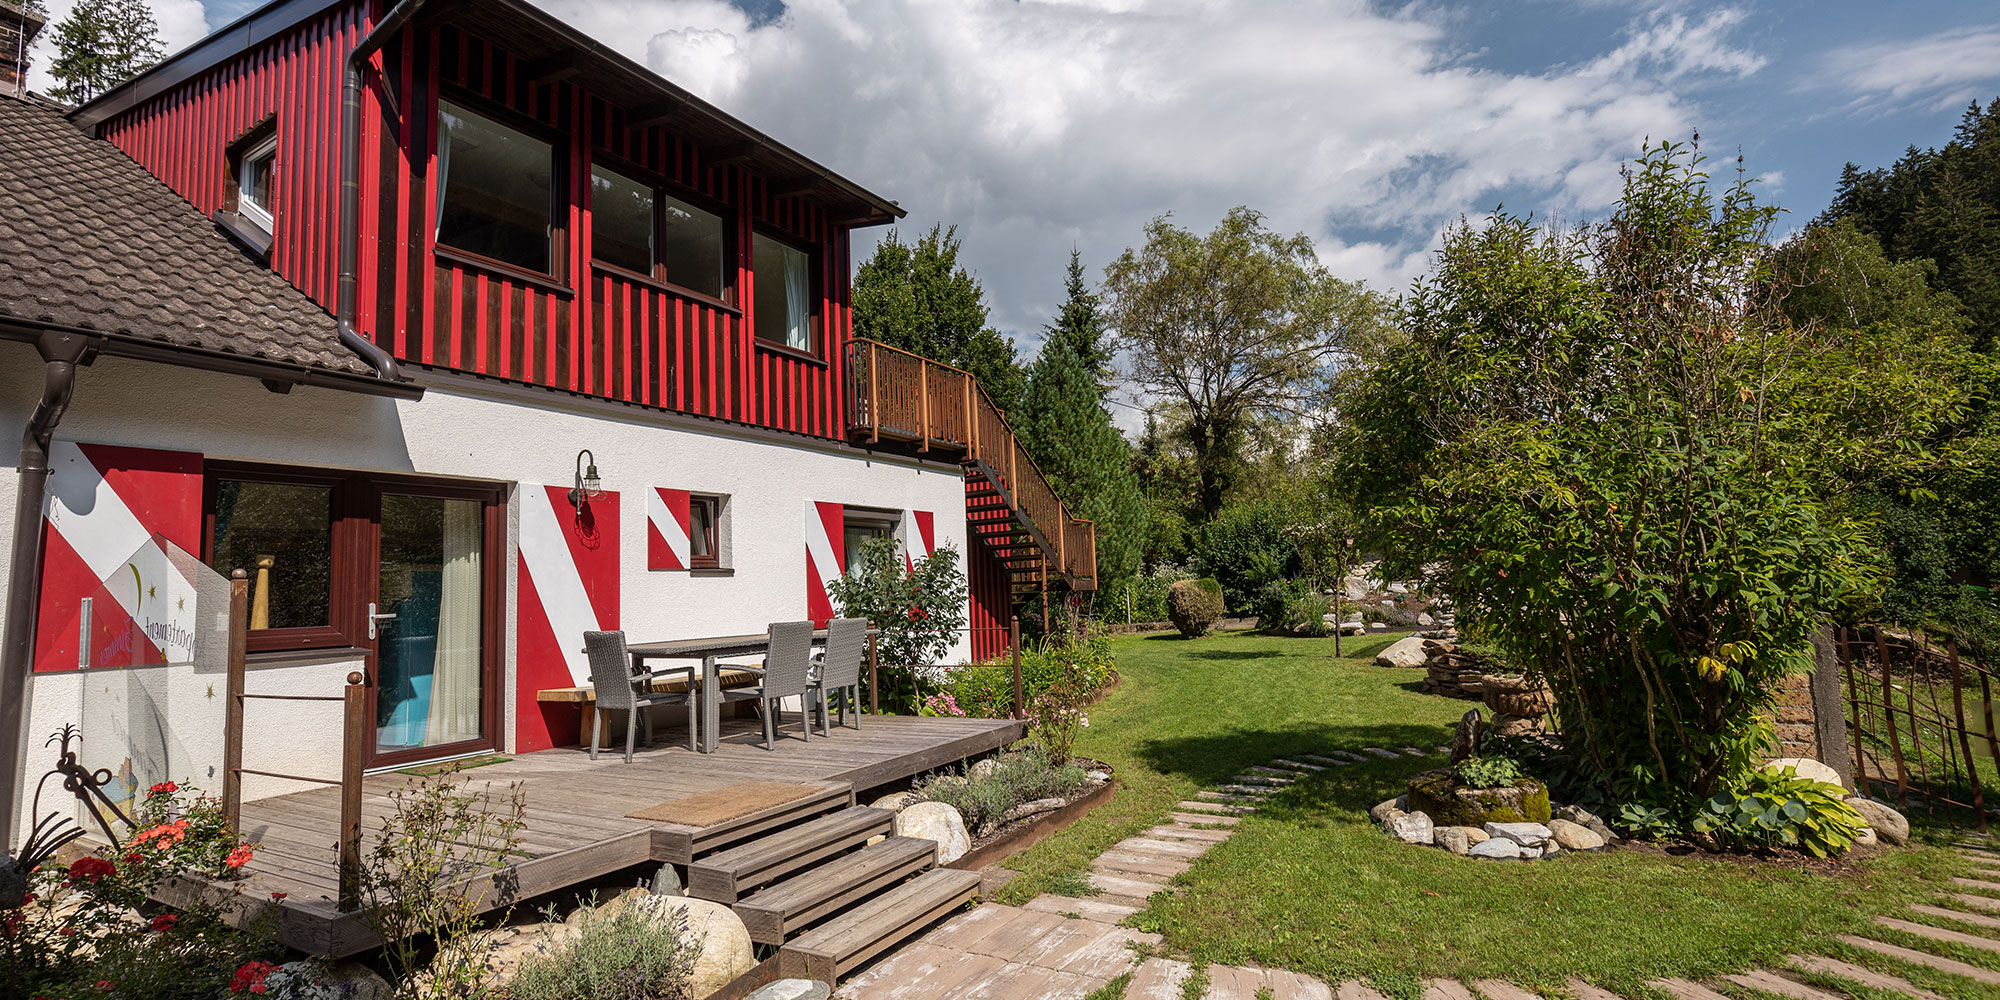 Kinderhotel Babyhotel - Flusschalet - Kärnten